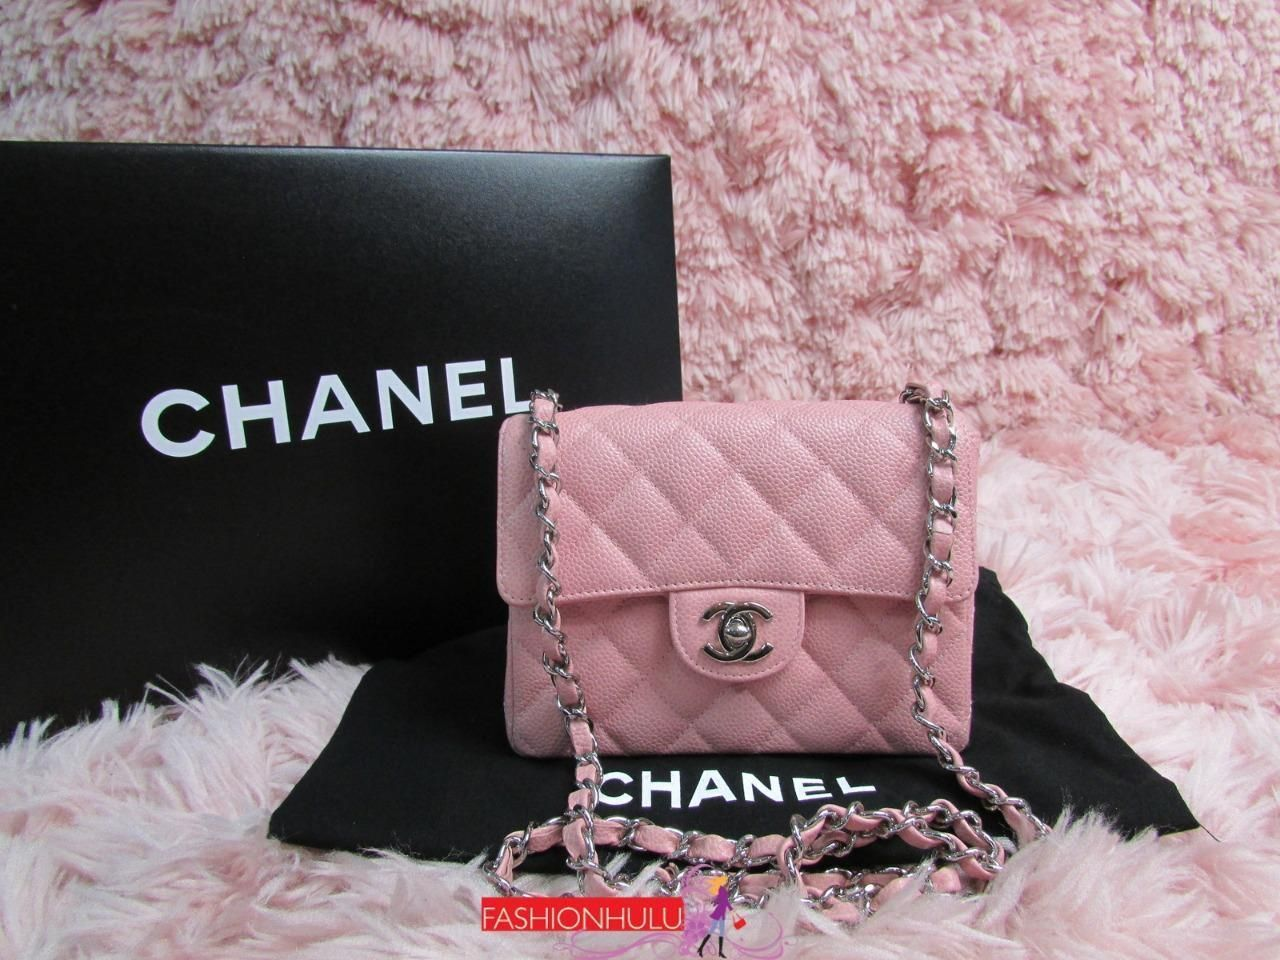 4638a19c82c8 Vintage chanel in 2019 | Vintage Chanel | Chanel, Vintage chanel ...